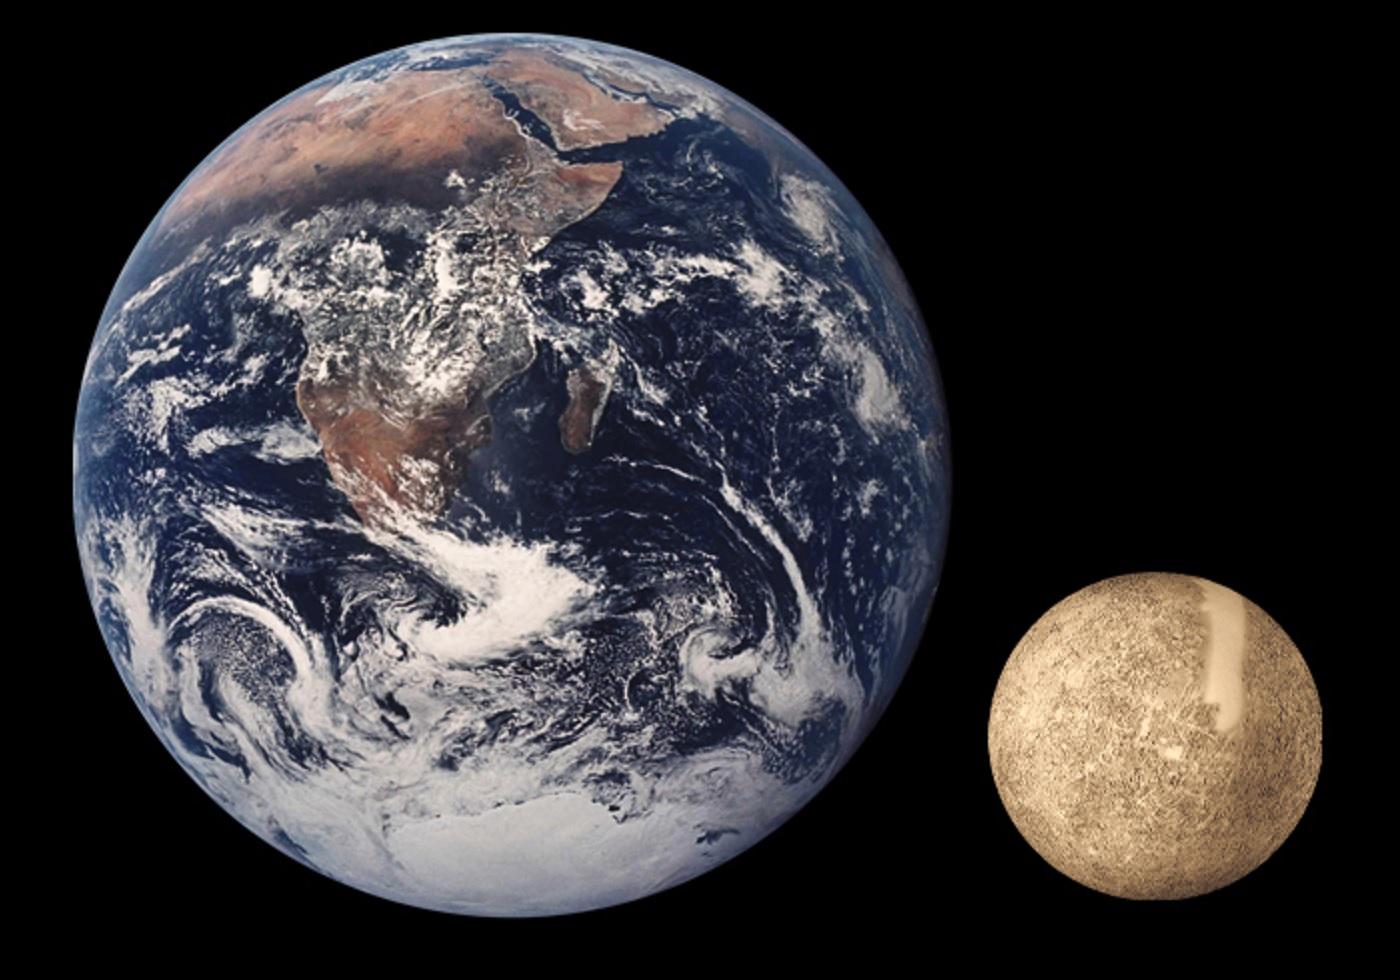 mercury compared to earth